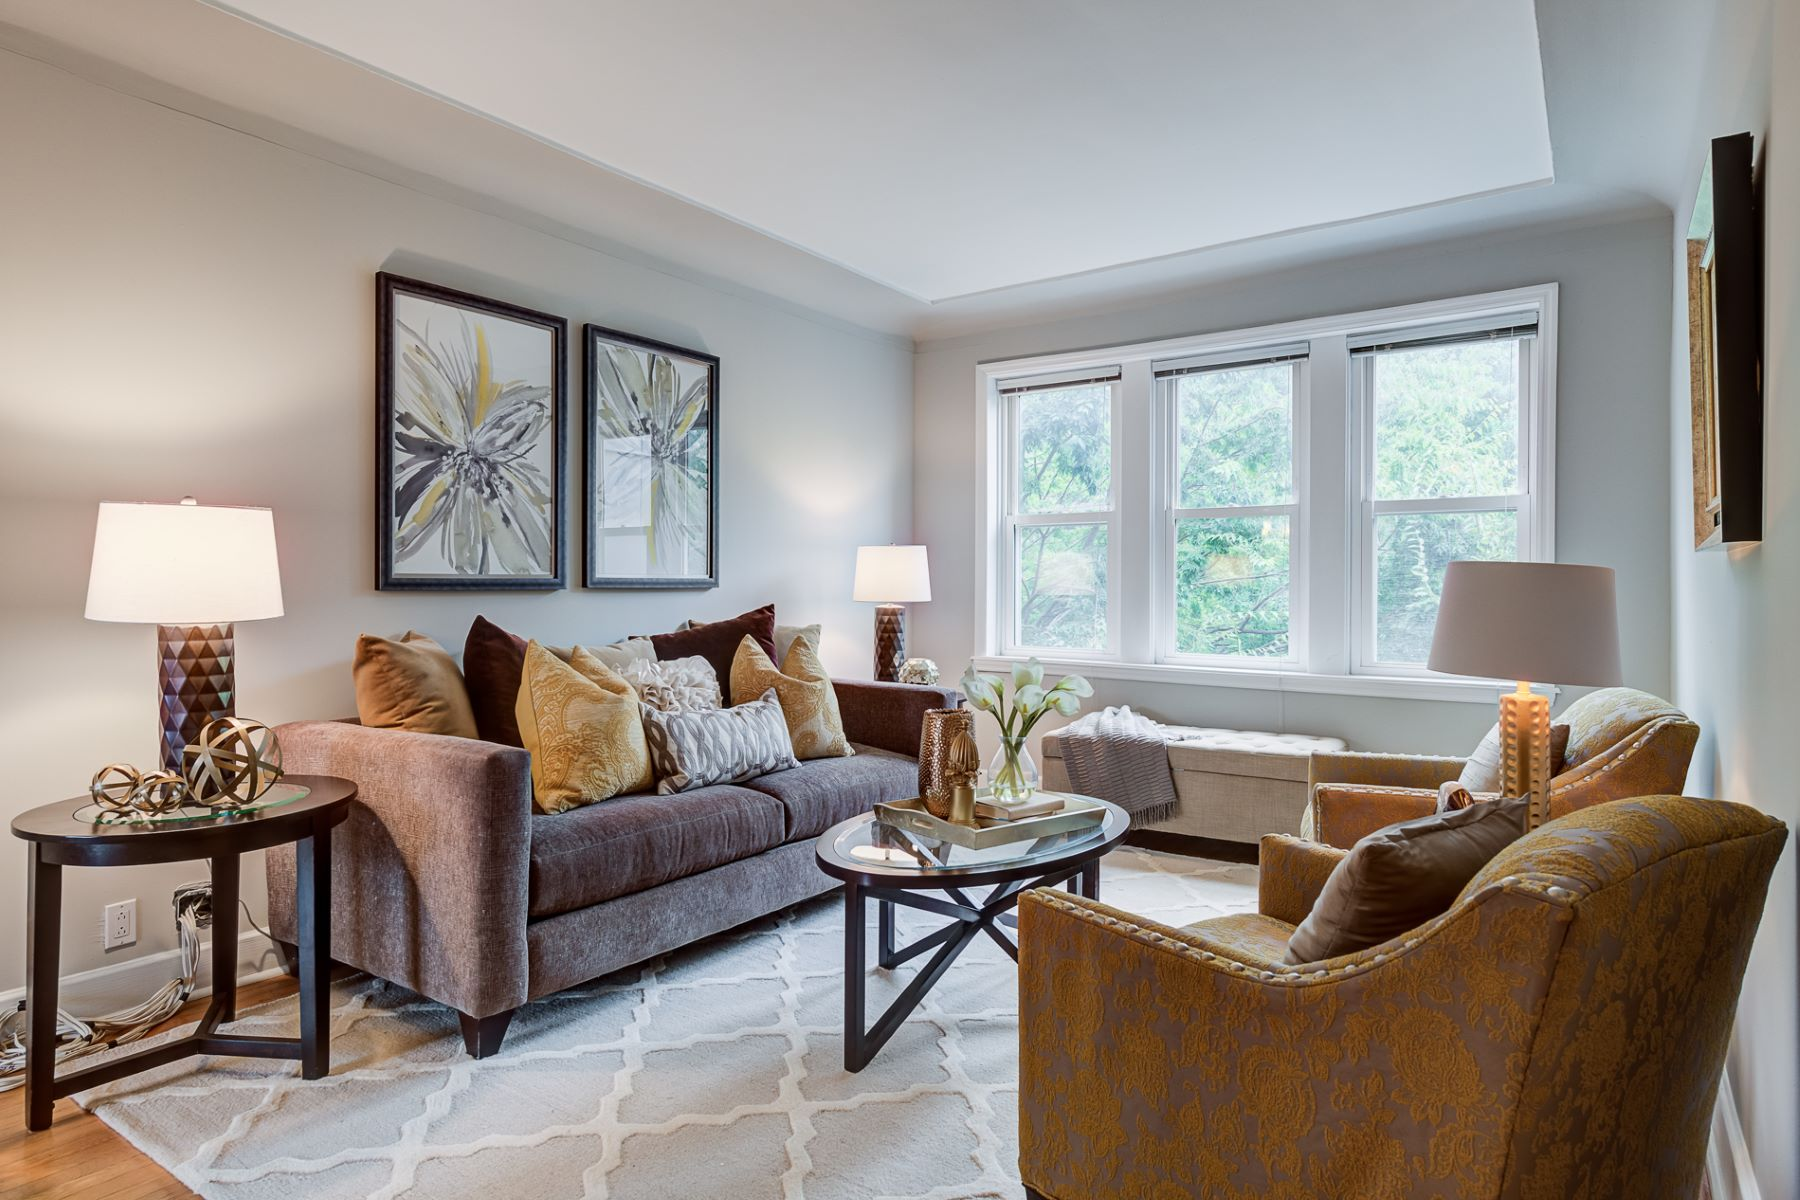 Additional photo for property listing at Kingsbury Blvd 7745 Kingsbury Blvd # 22 Clayton, Missouri 63131 United States